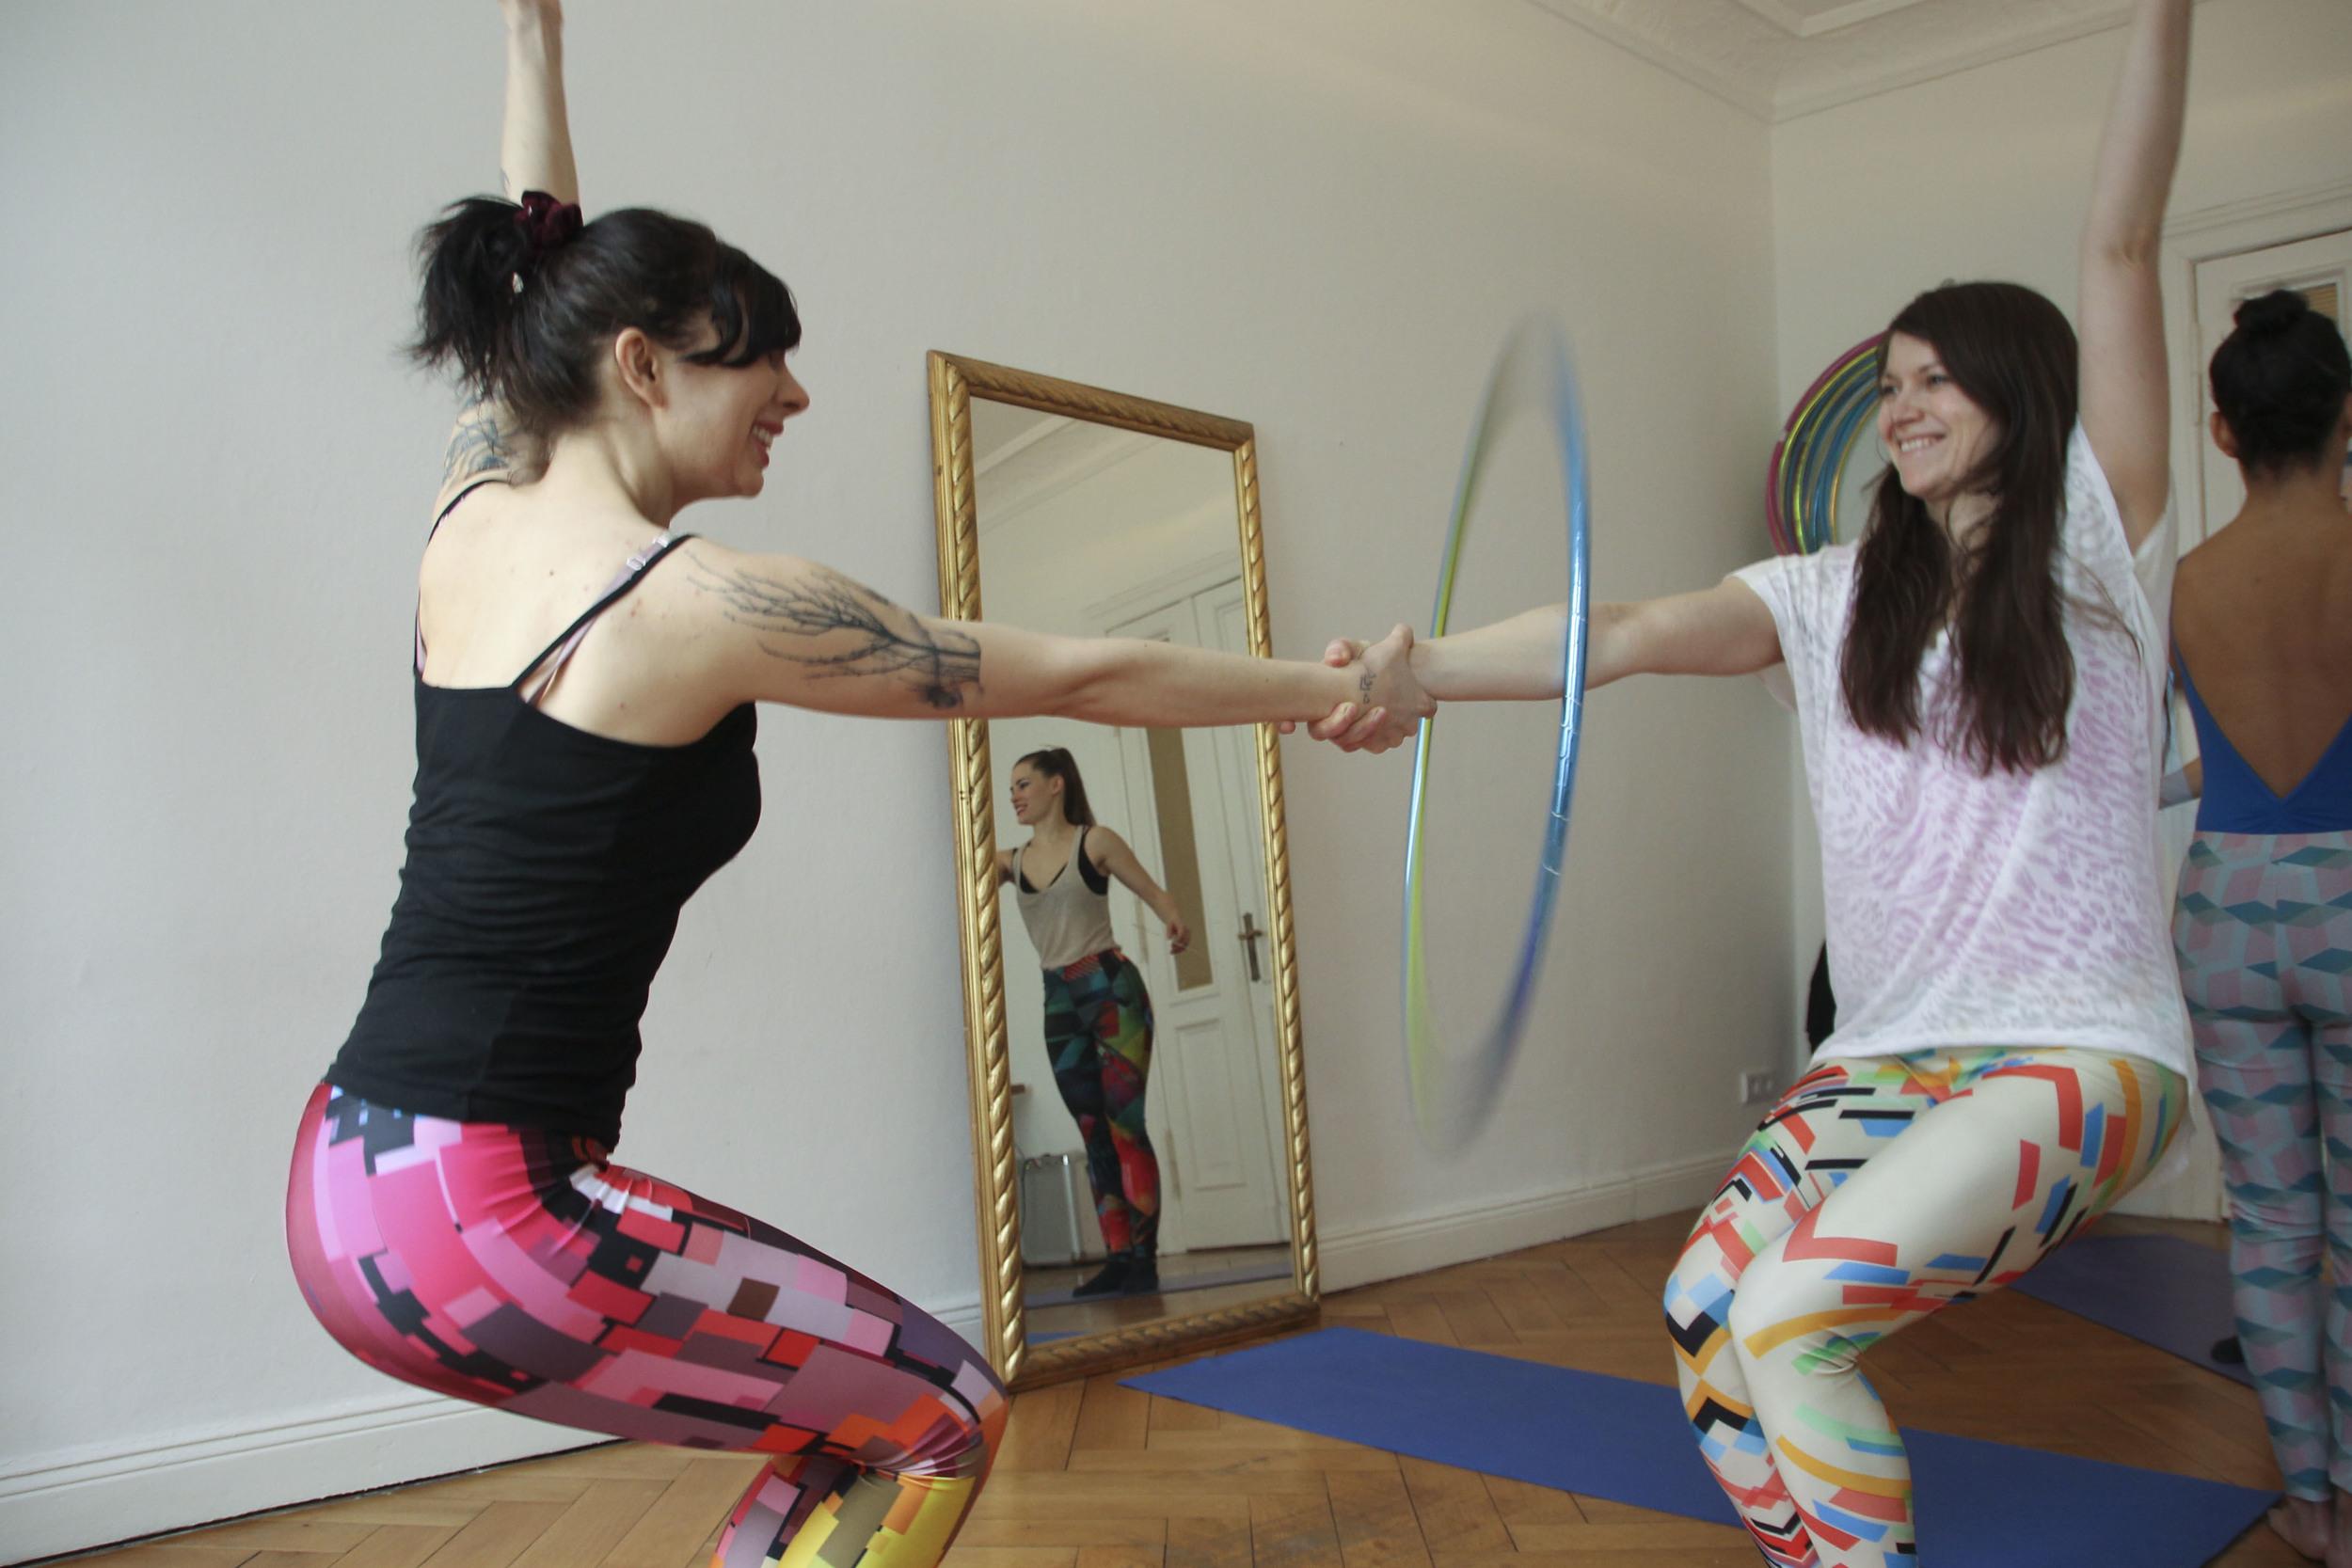 hoop yoga rebecca halls berlin1289.jpg